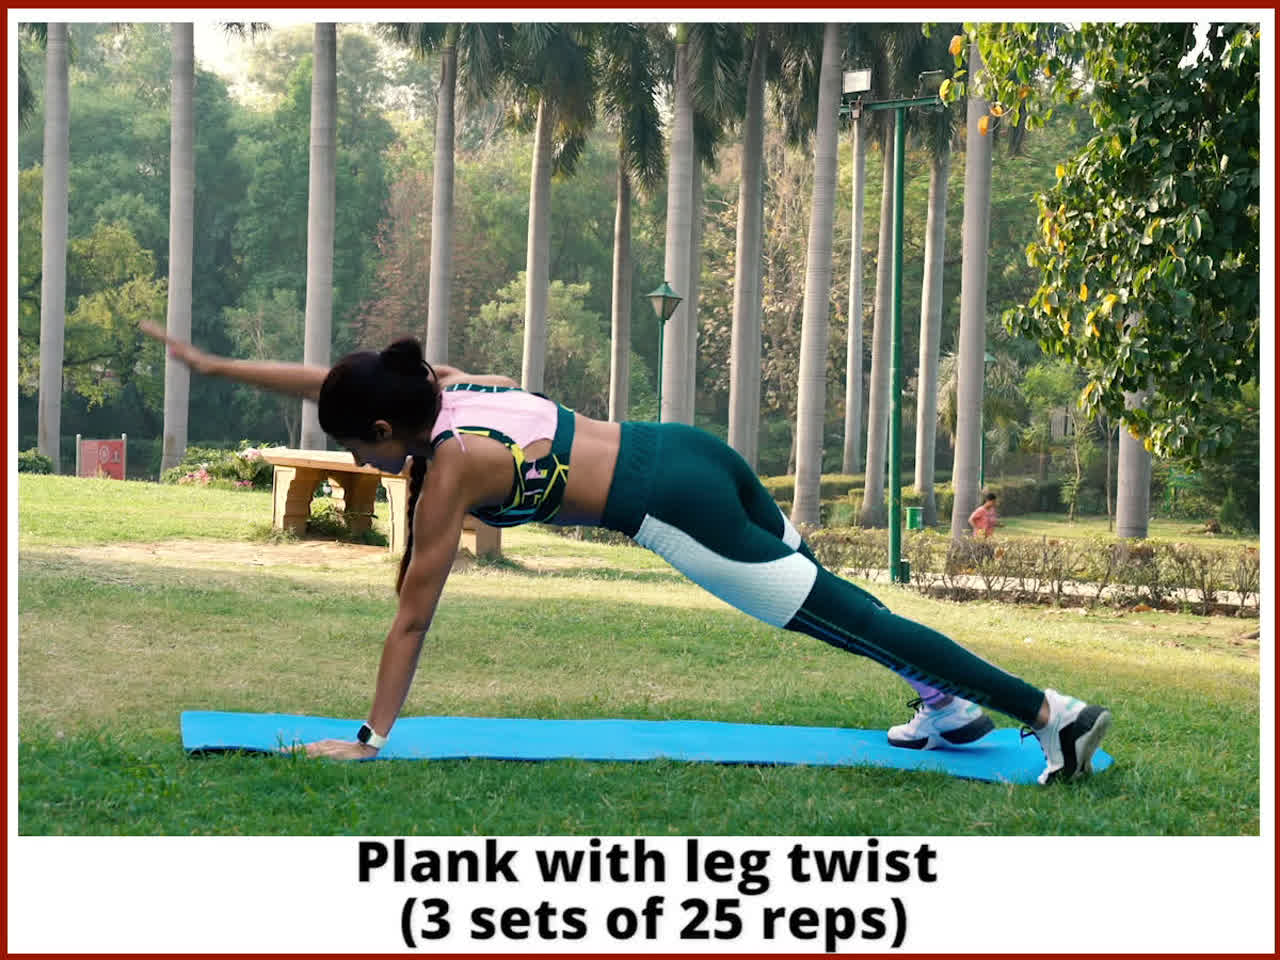 Plank with leg twist